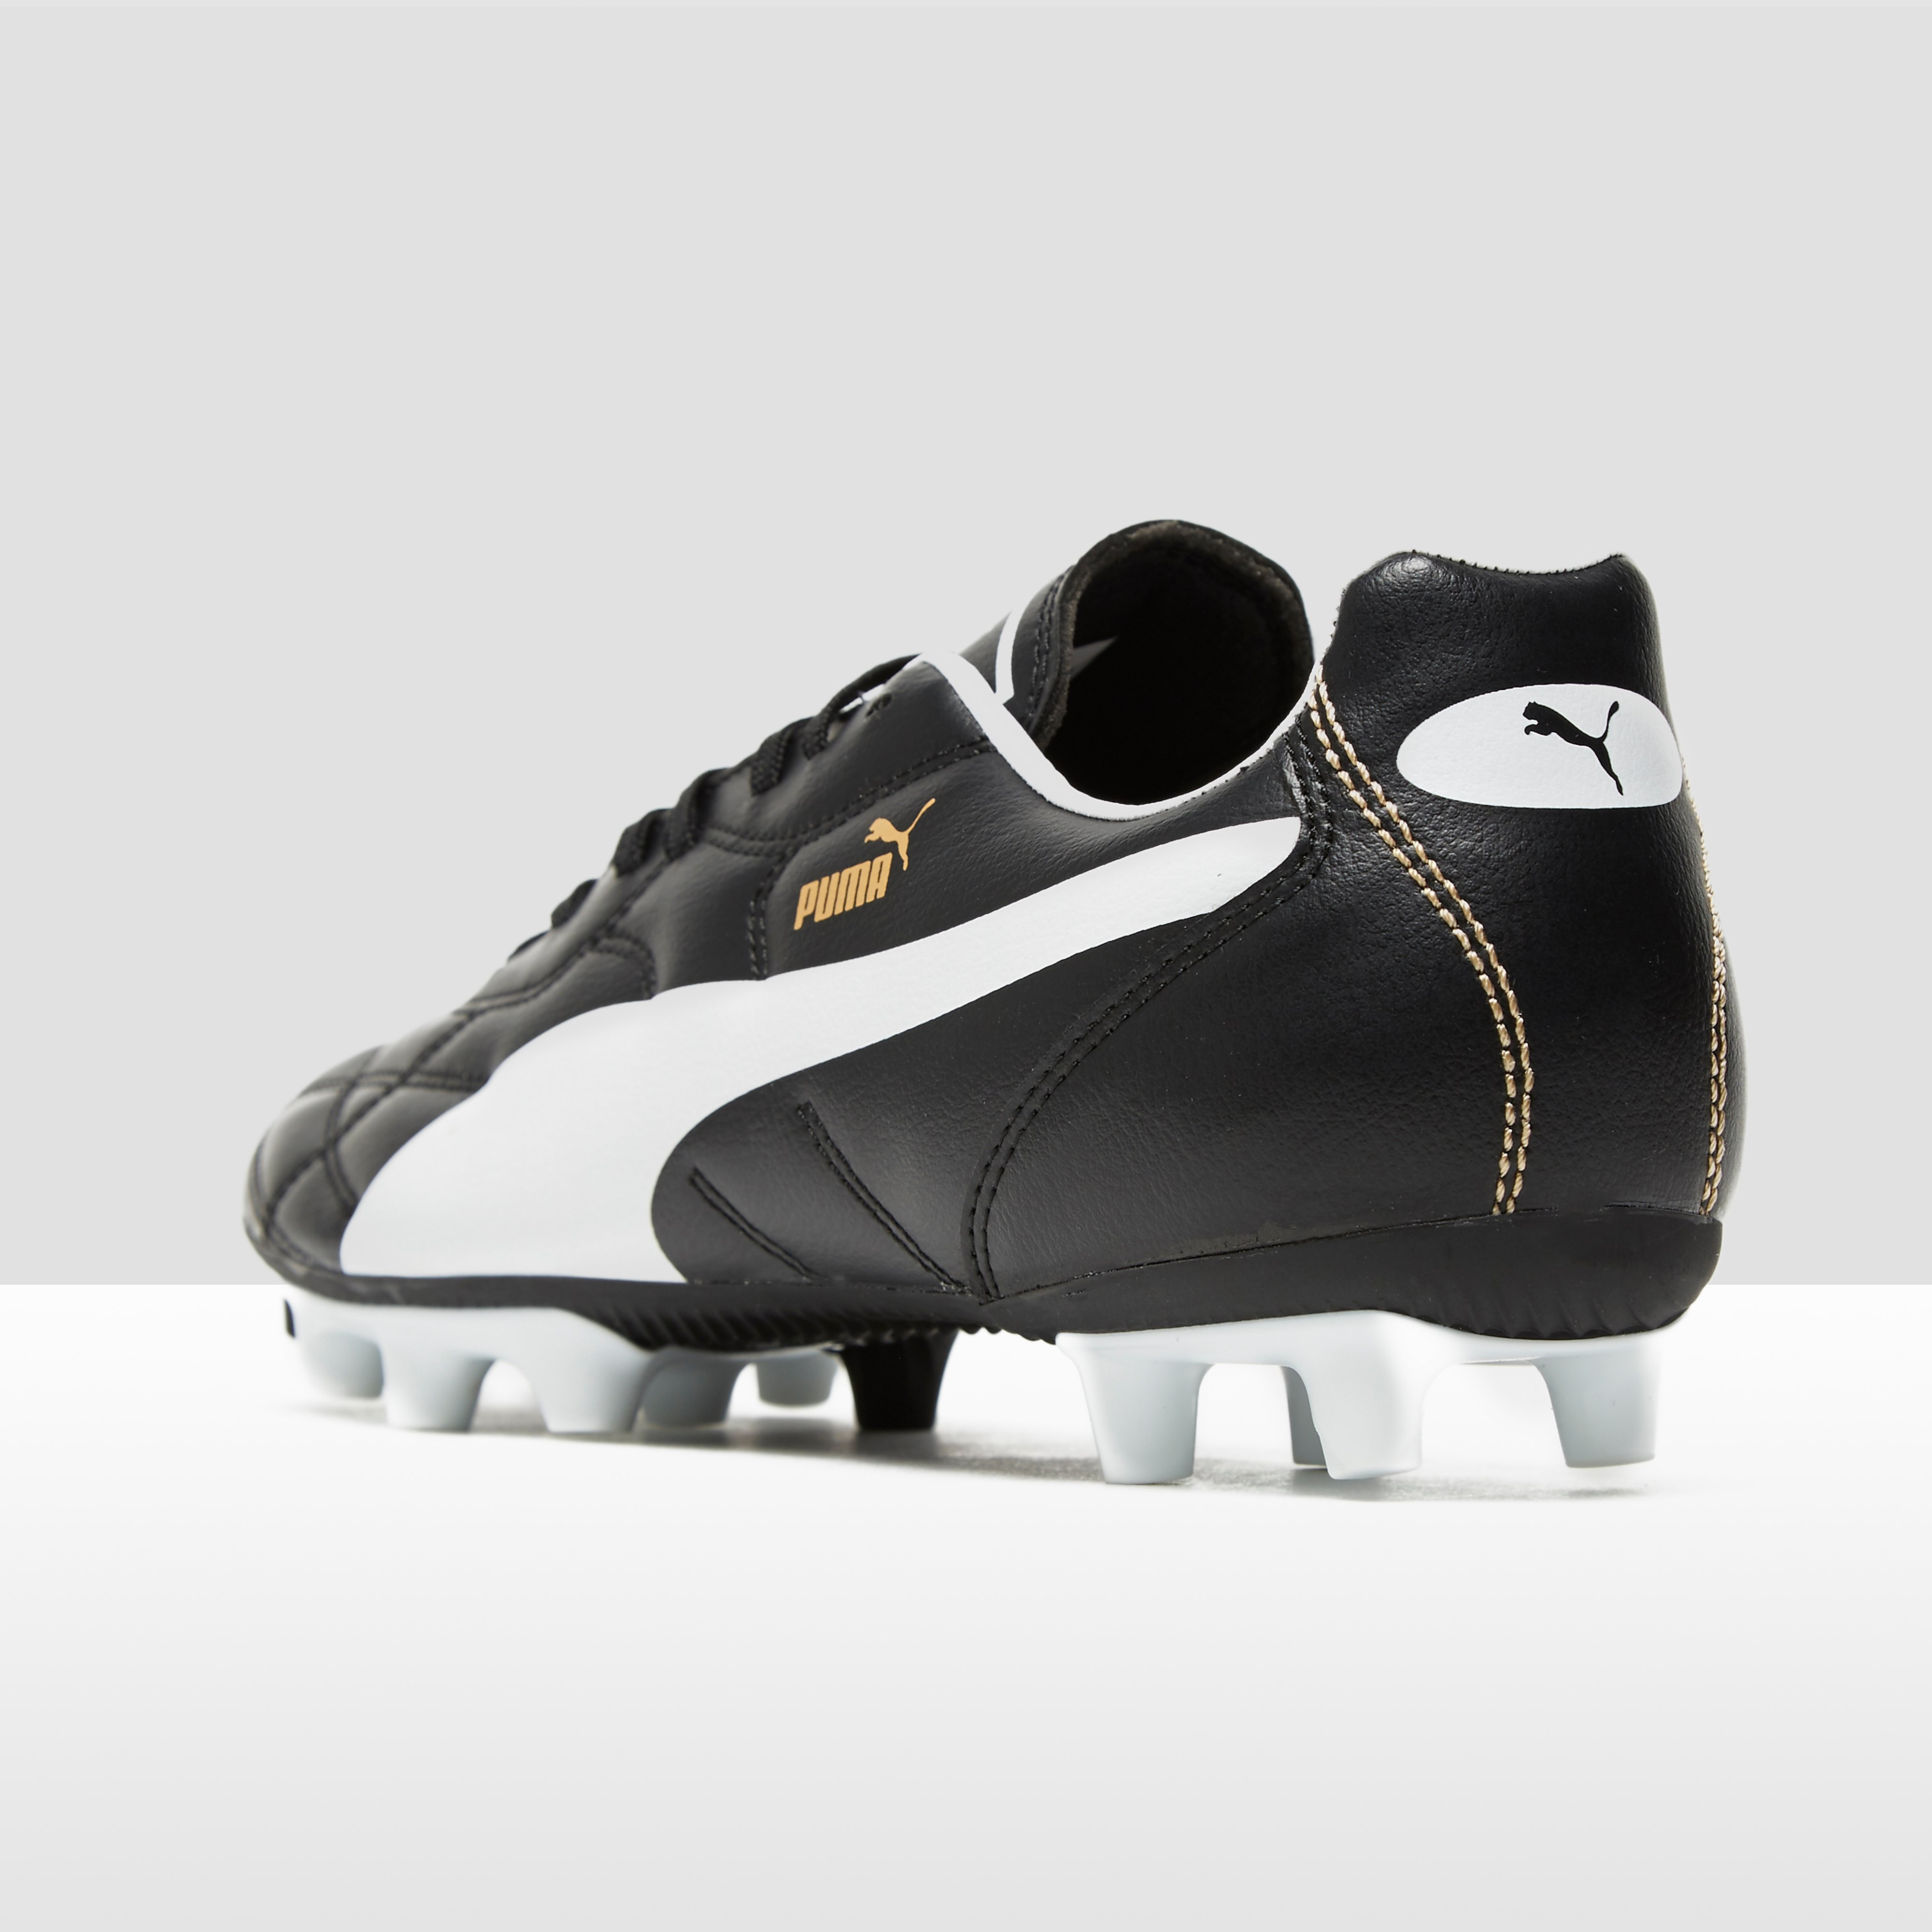 Puma Classico iFG Men's Football Boots